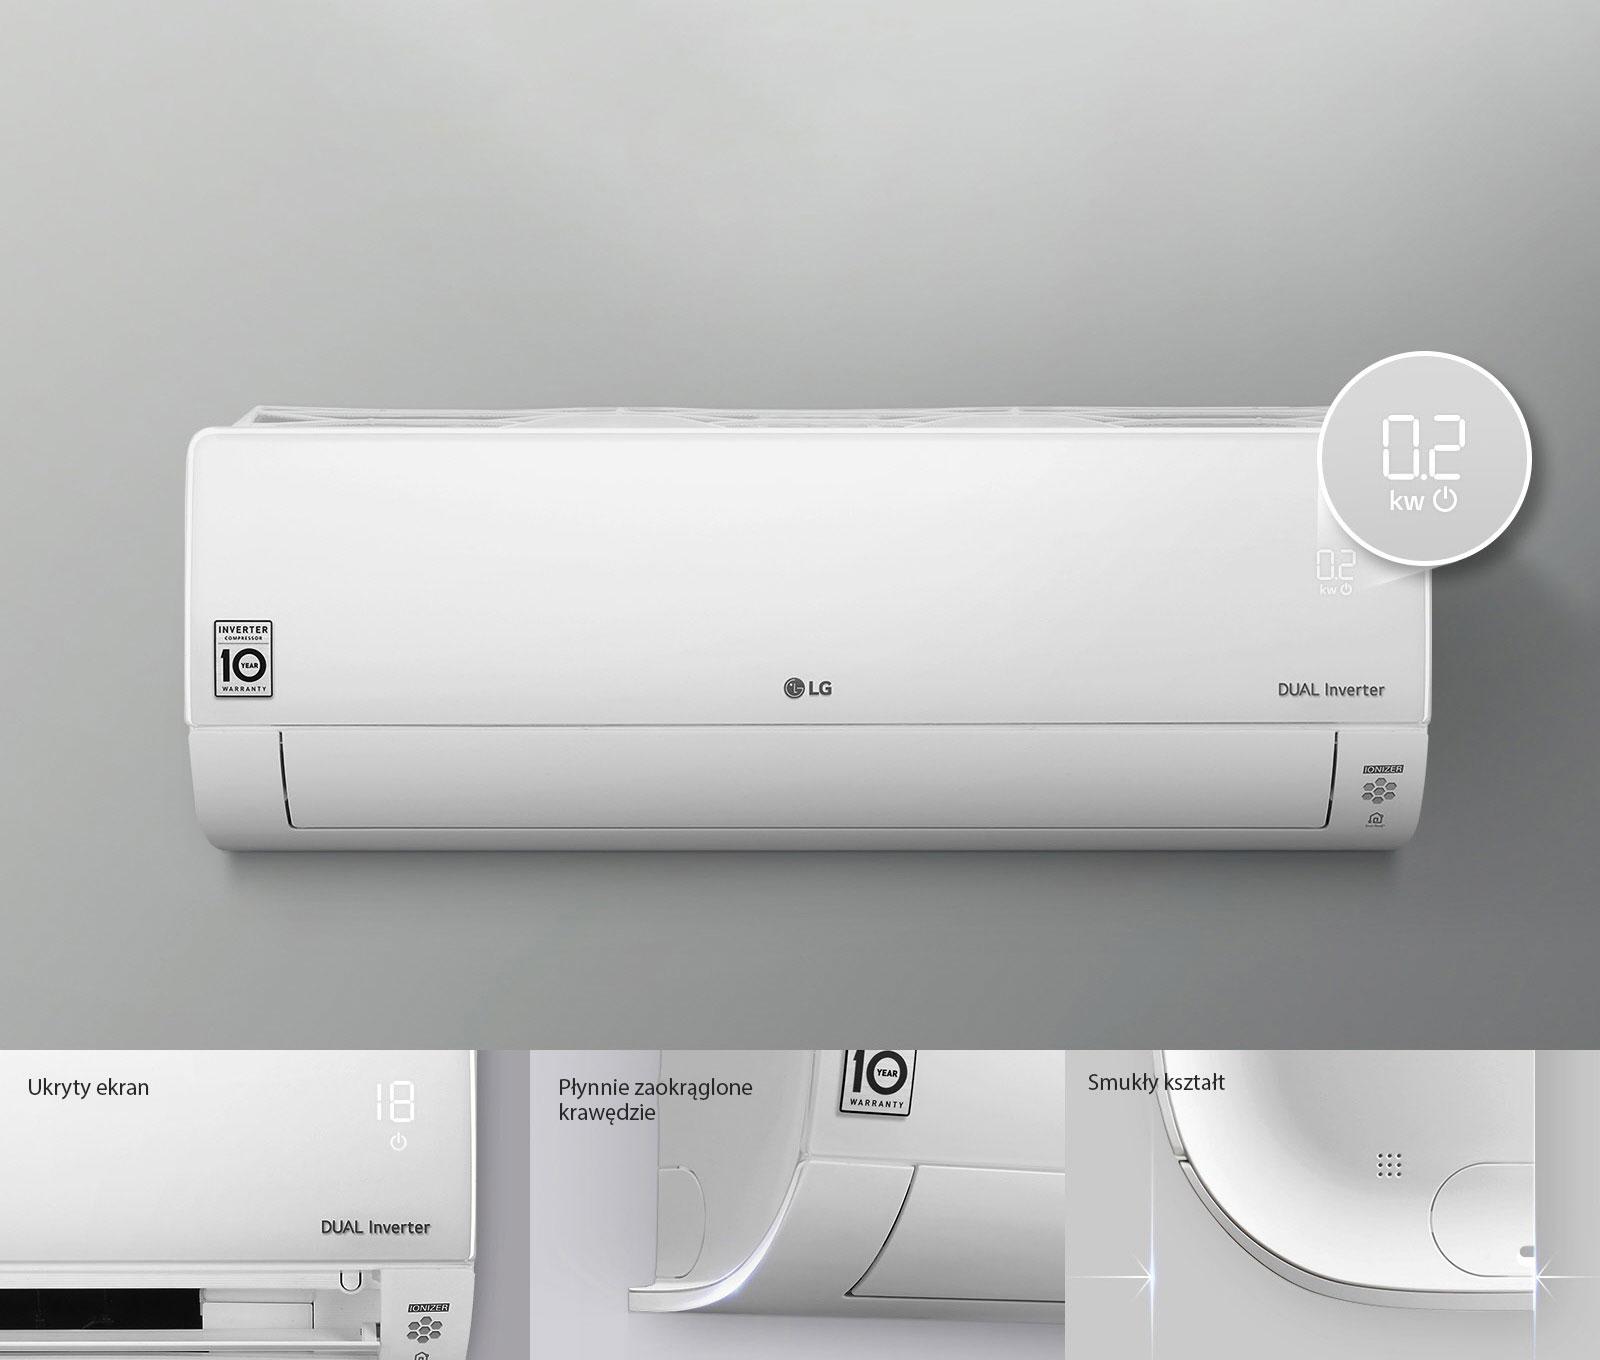 RAC-DUALCOOL-01-1-Smart-Energy-Display-D_v1